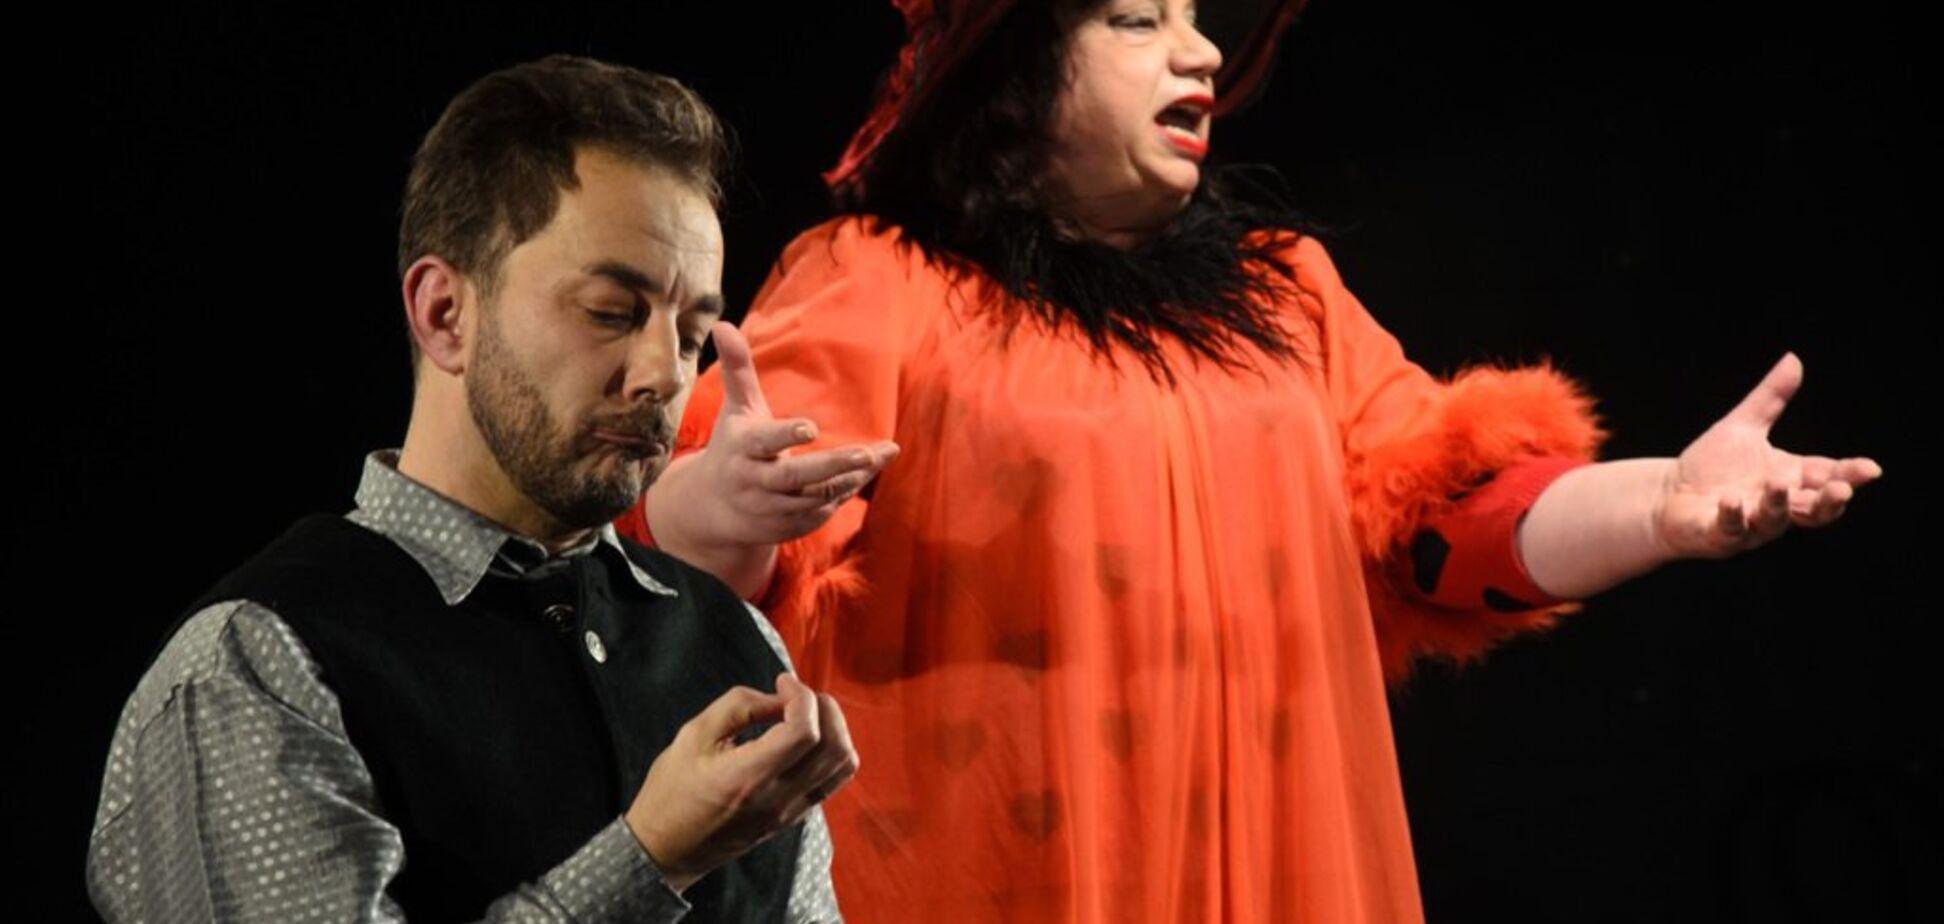 Київський театр покаже глядачам 'заборонене' закулісся